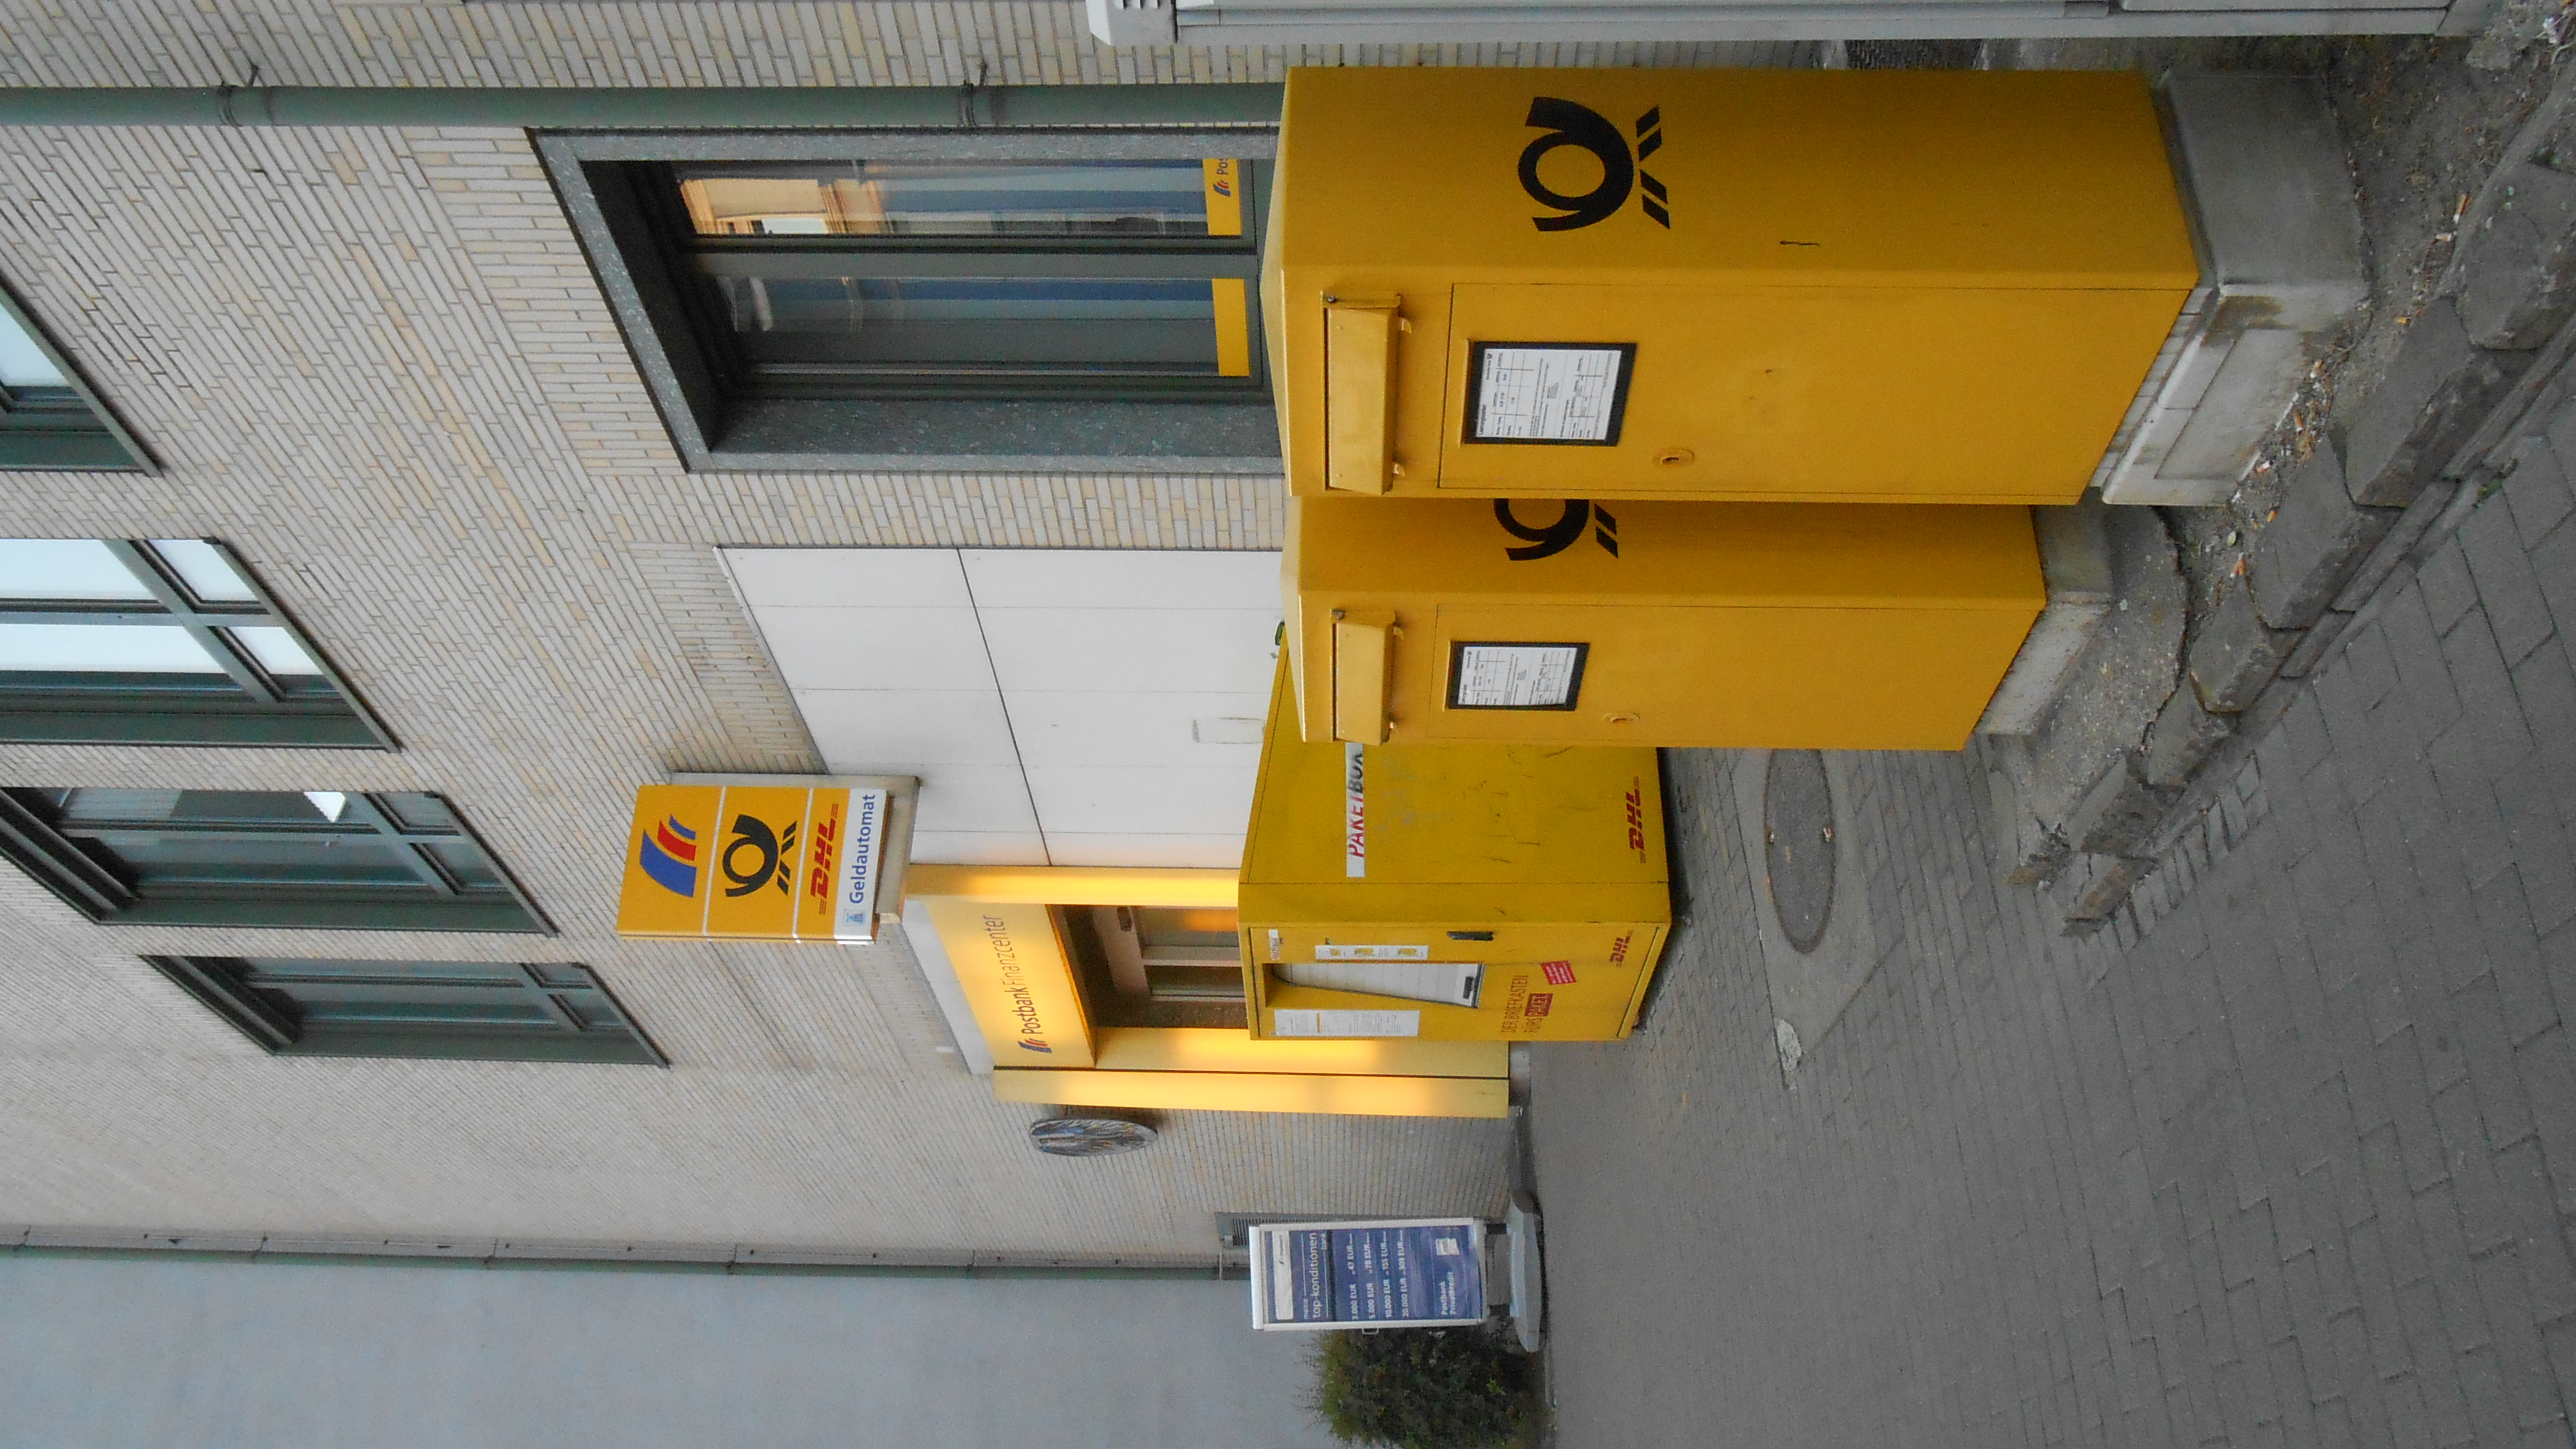 Postfiliale Dortmund